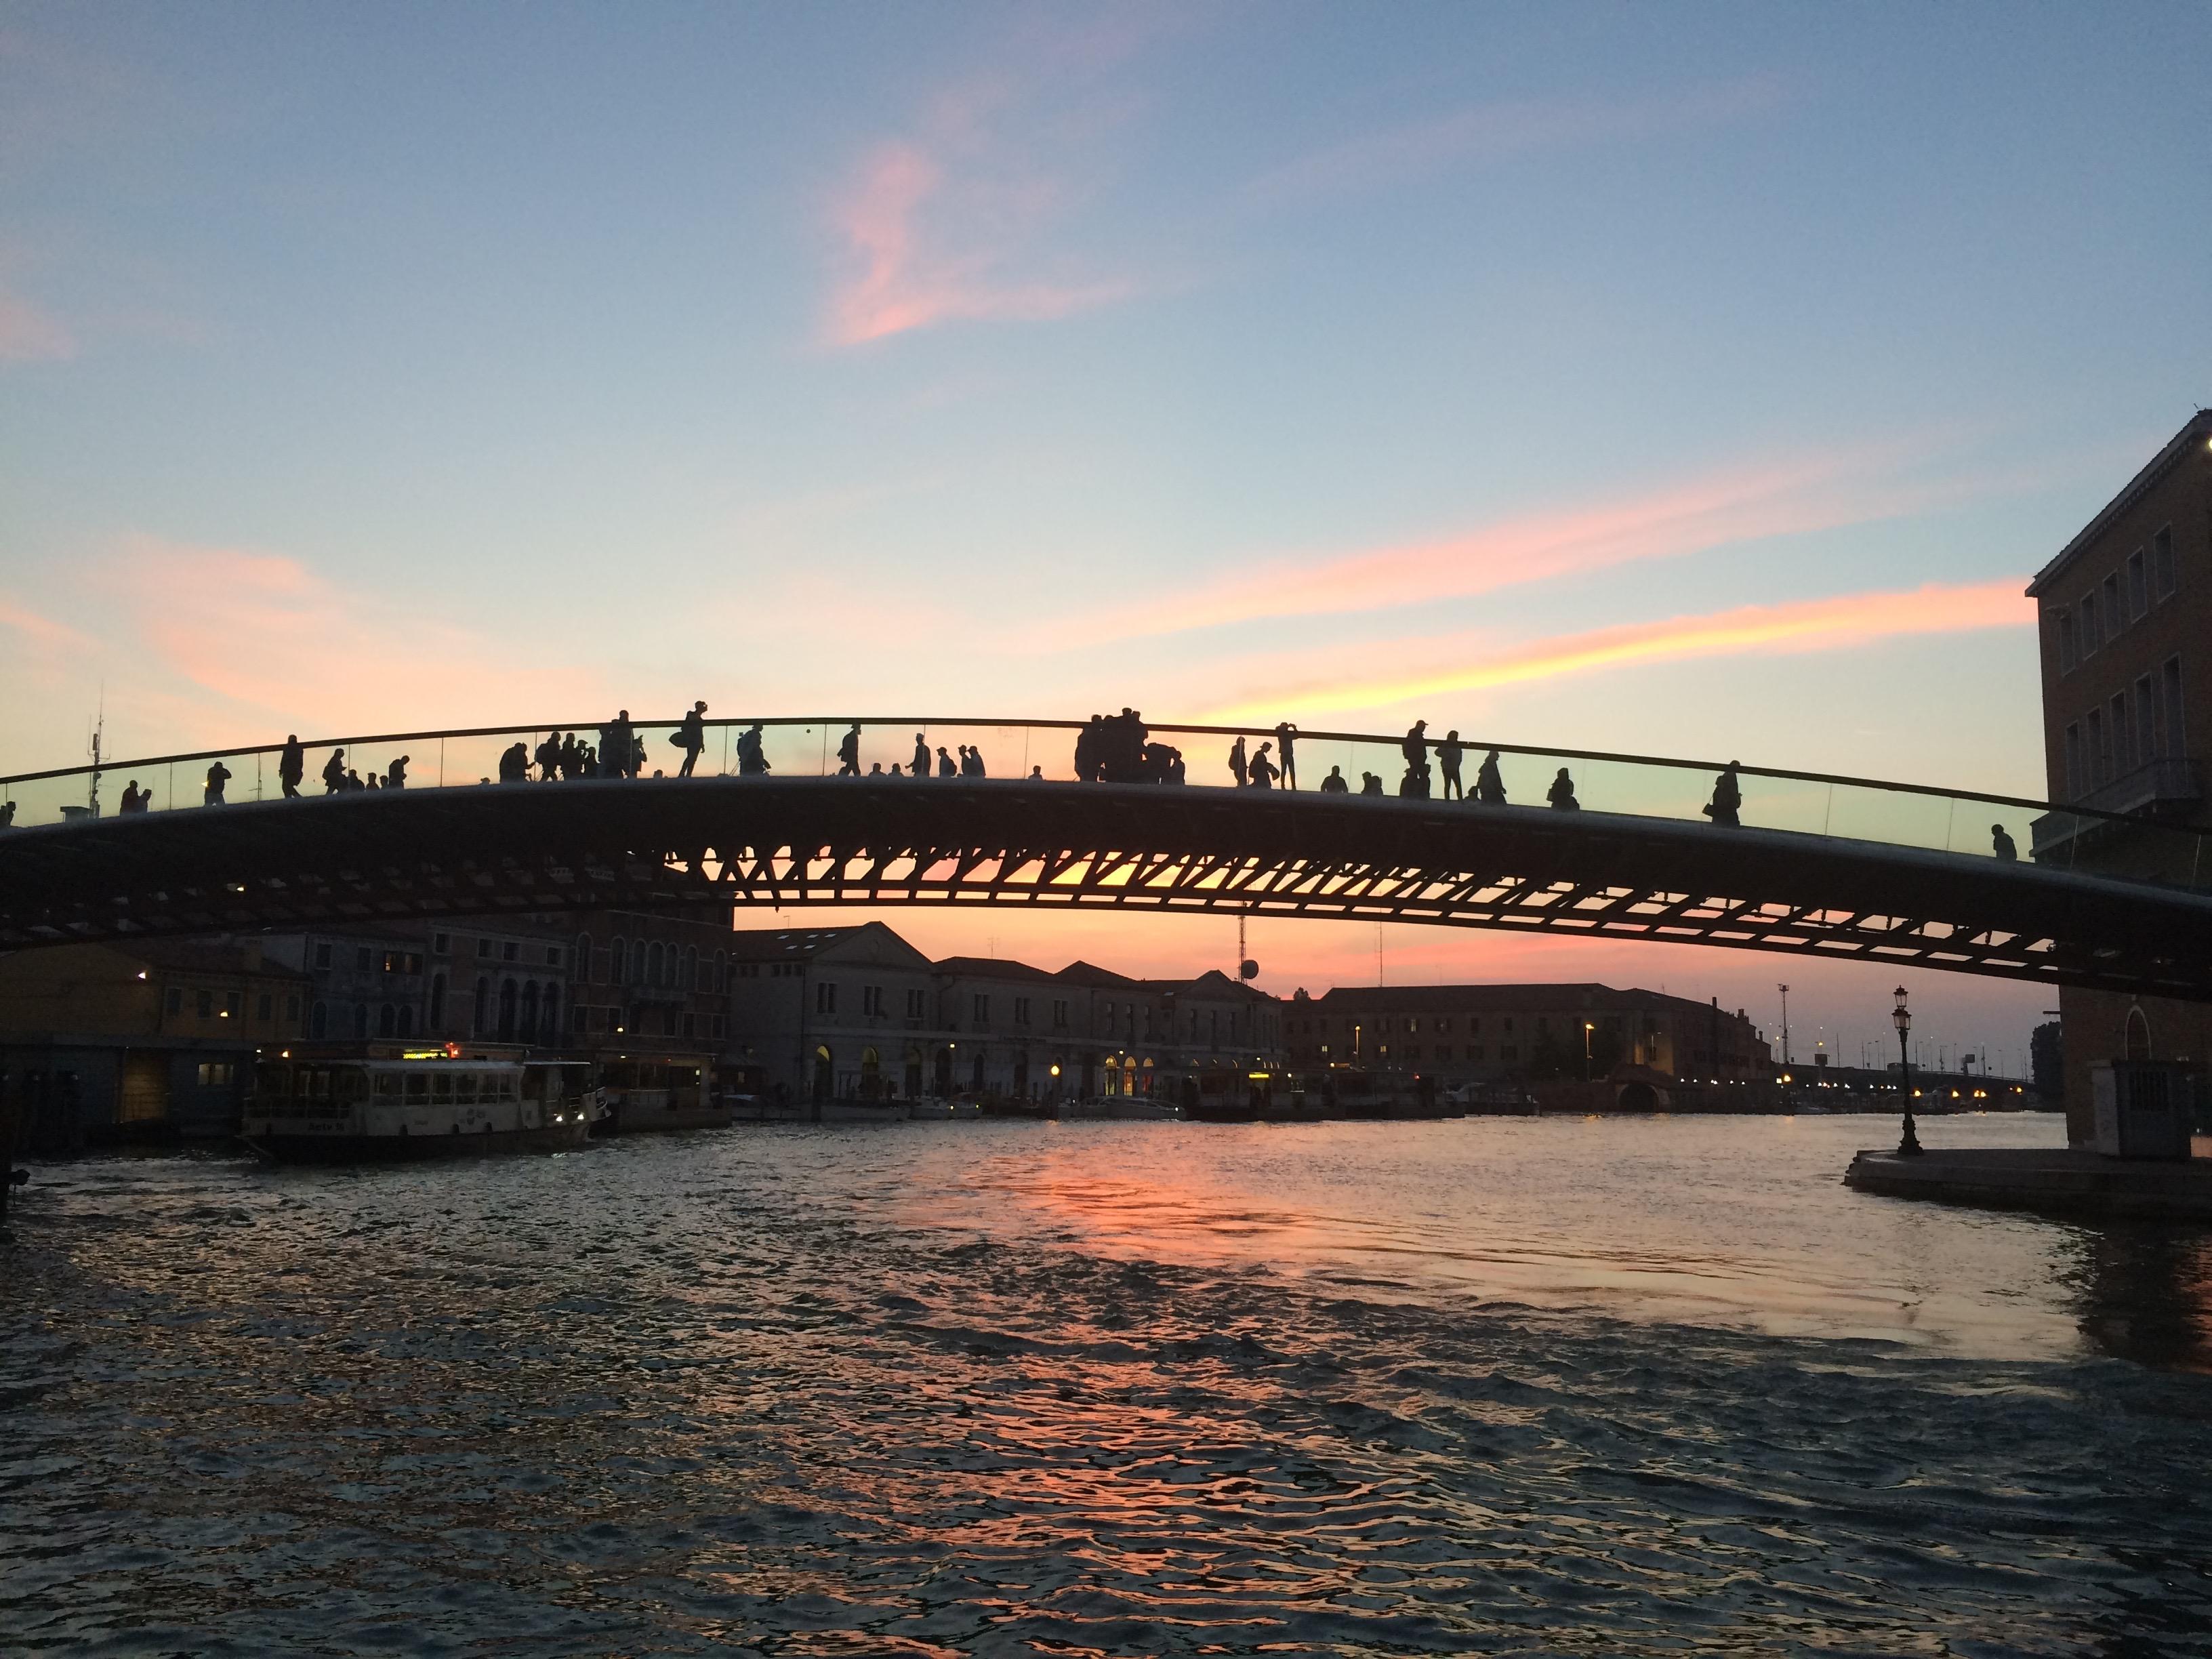 Venice Grand Canal Piazzale Roma sunset figures on bridge